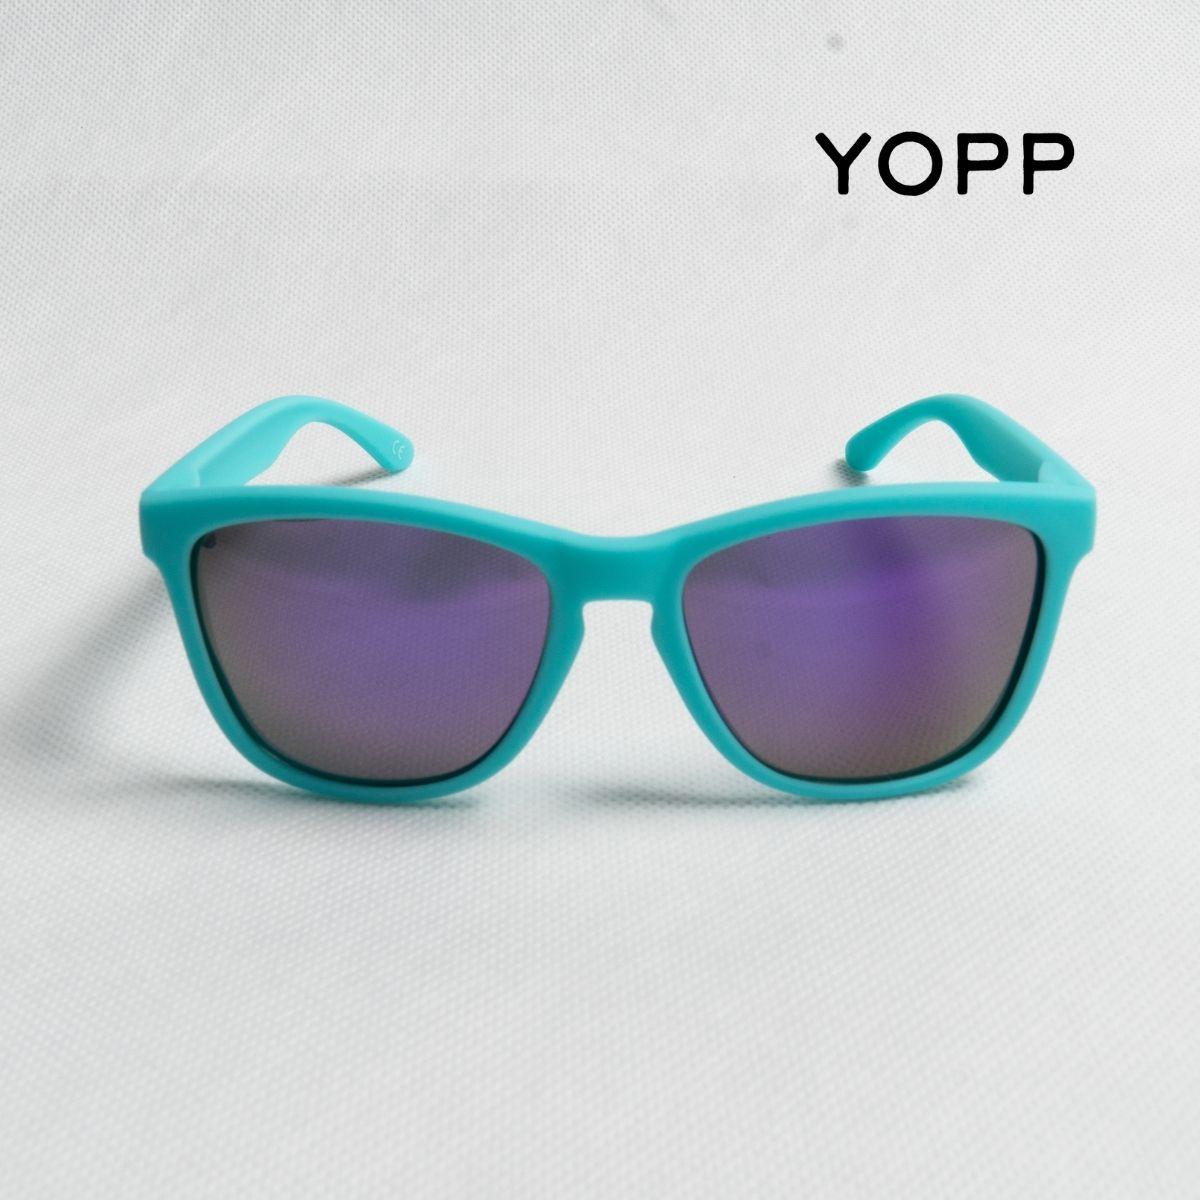 Óculos YOPP AQUAMARINE  - Vivian Bógus